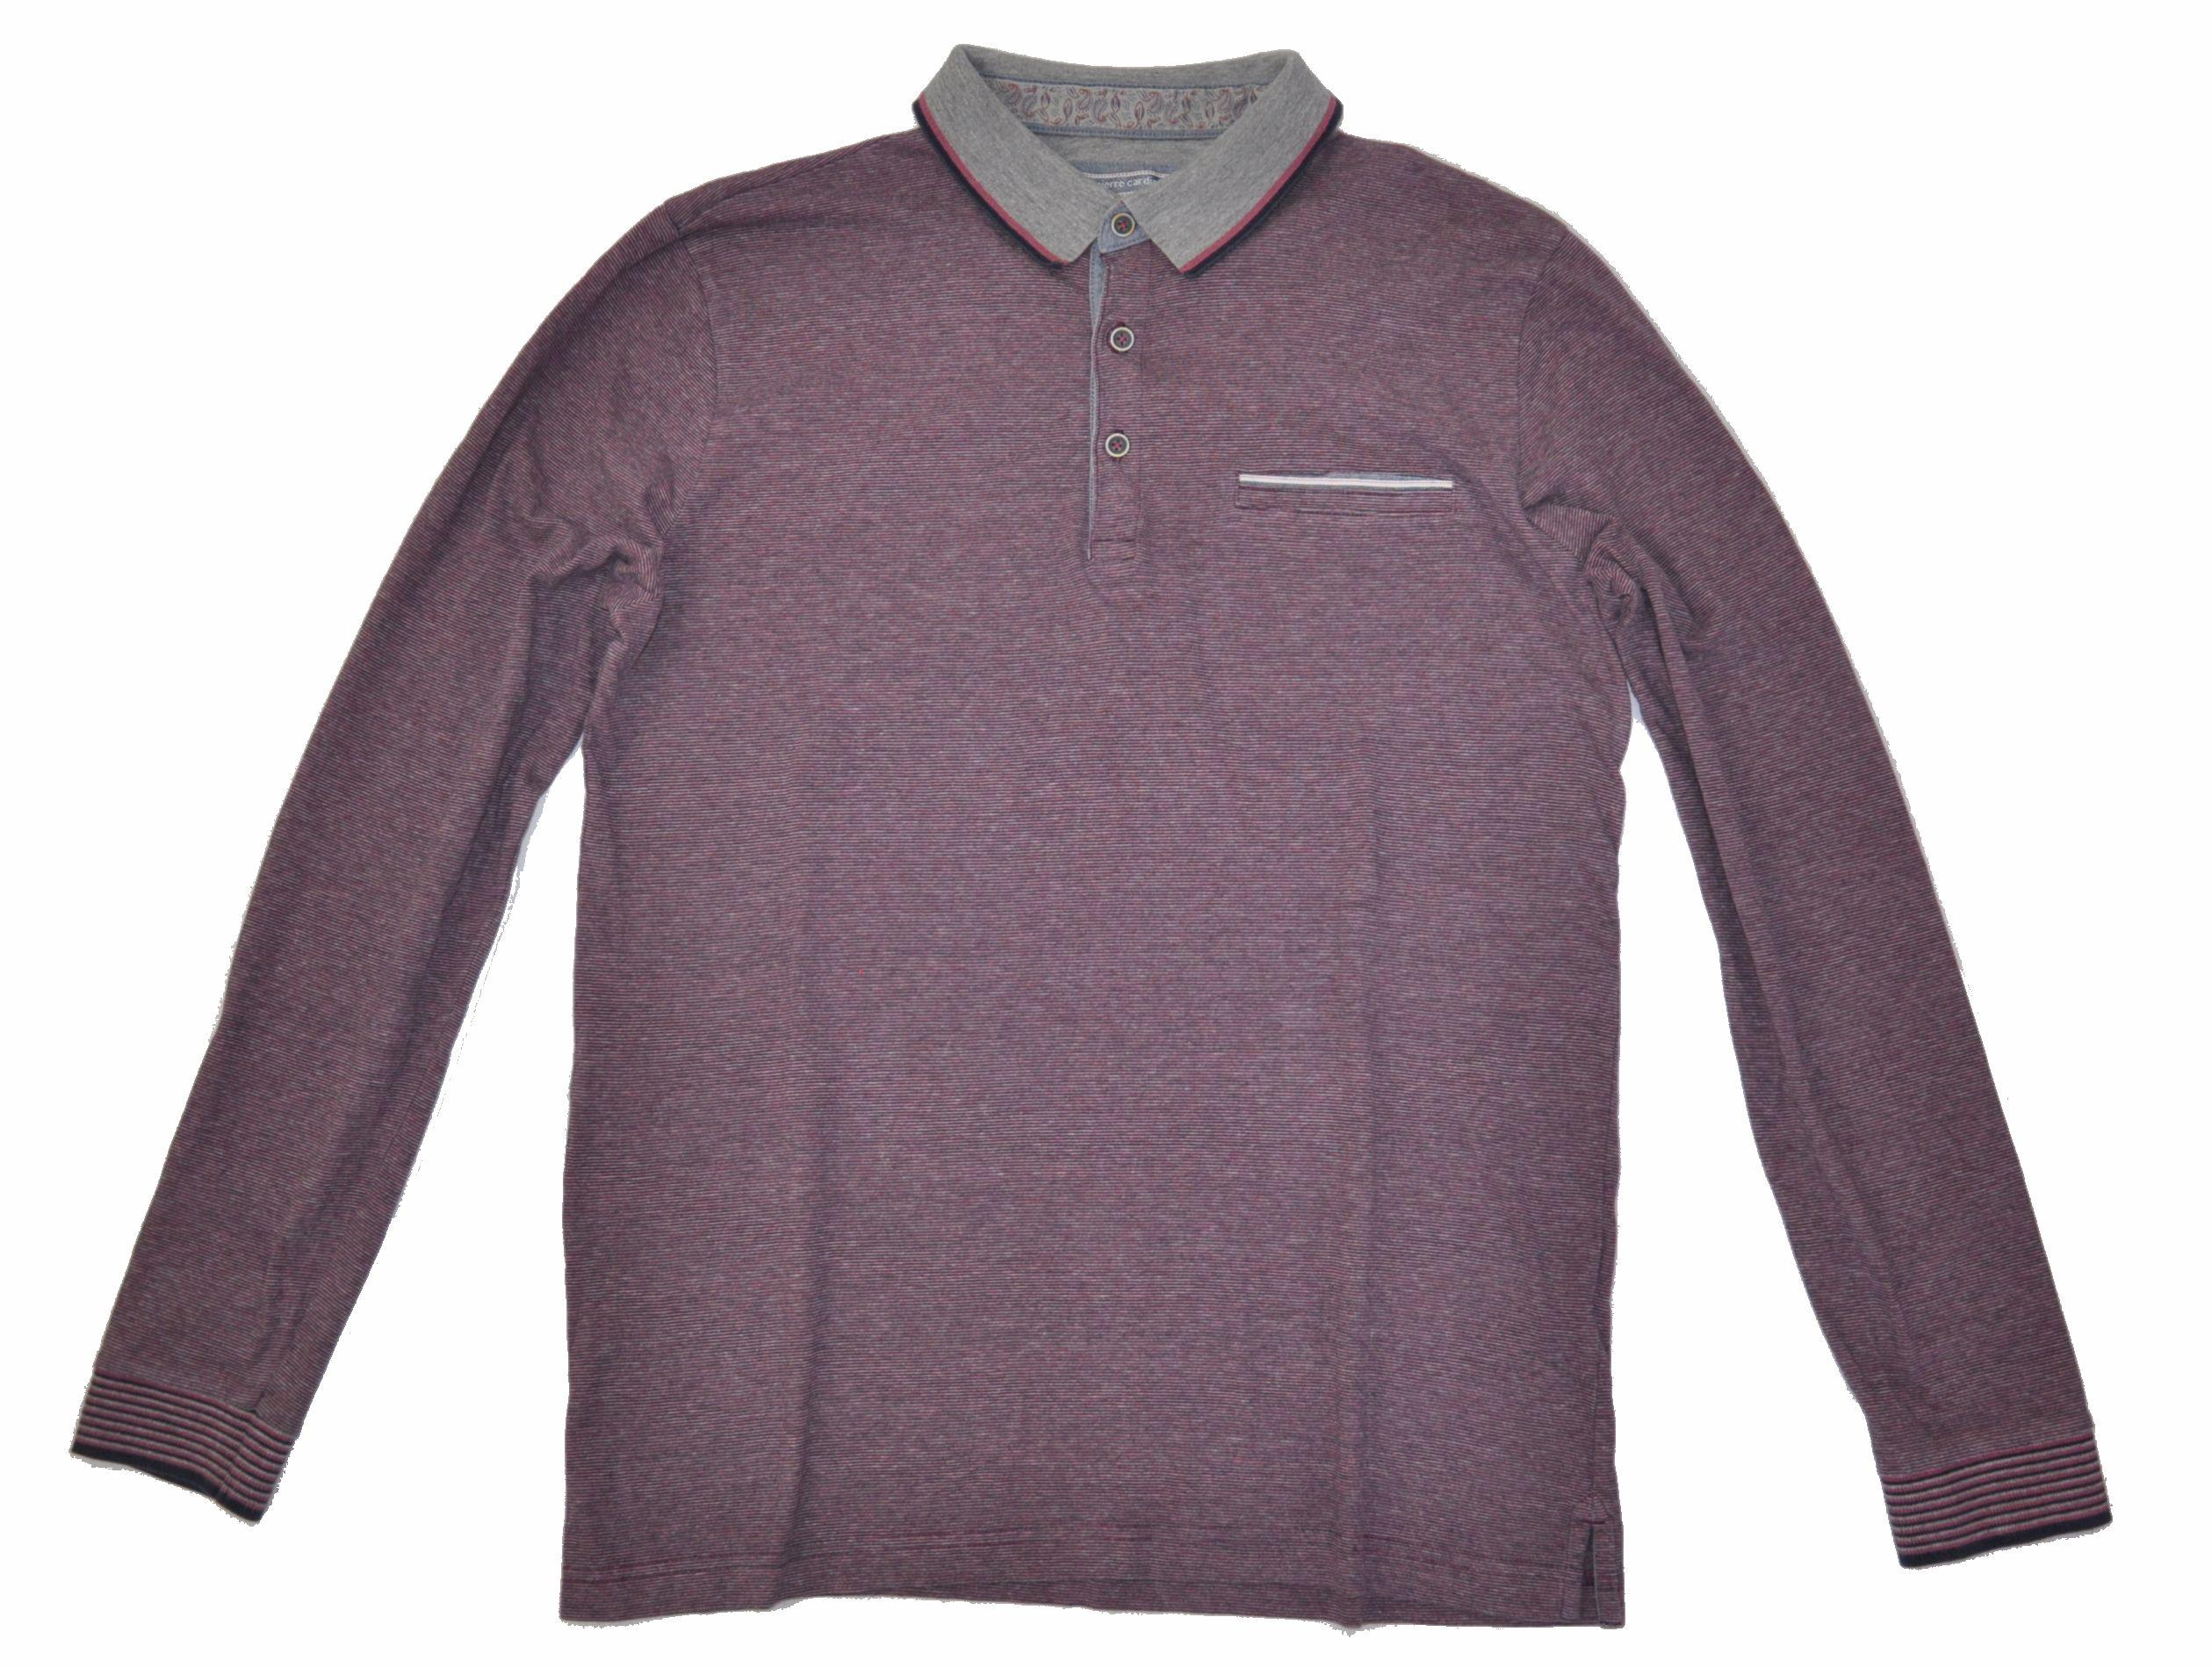 PIERRE CARDIN bluzka koszulka męska M